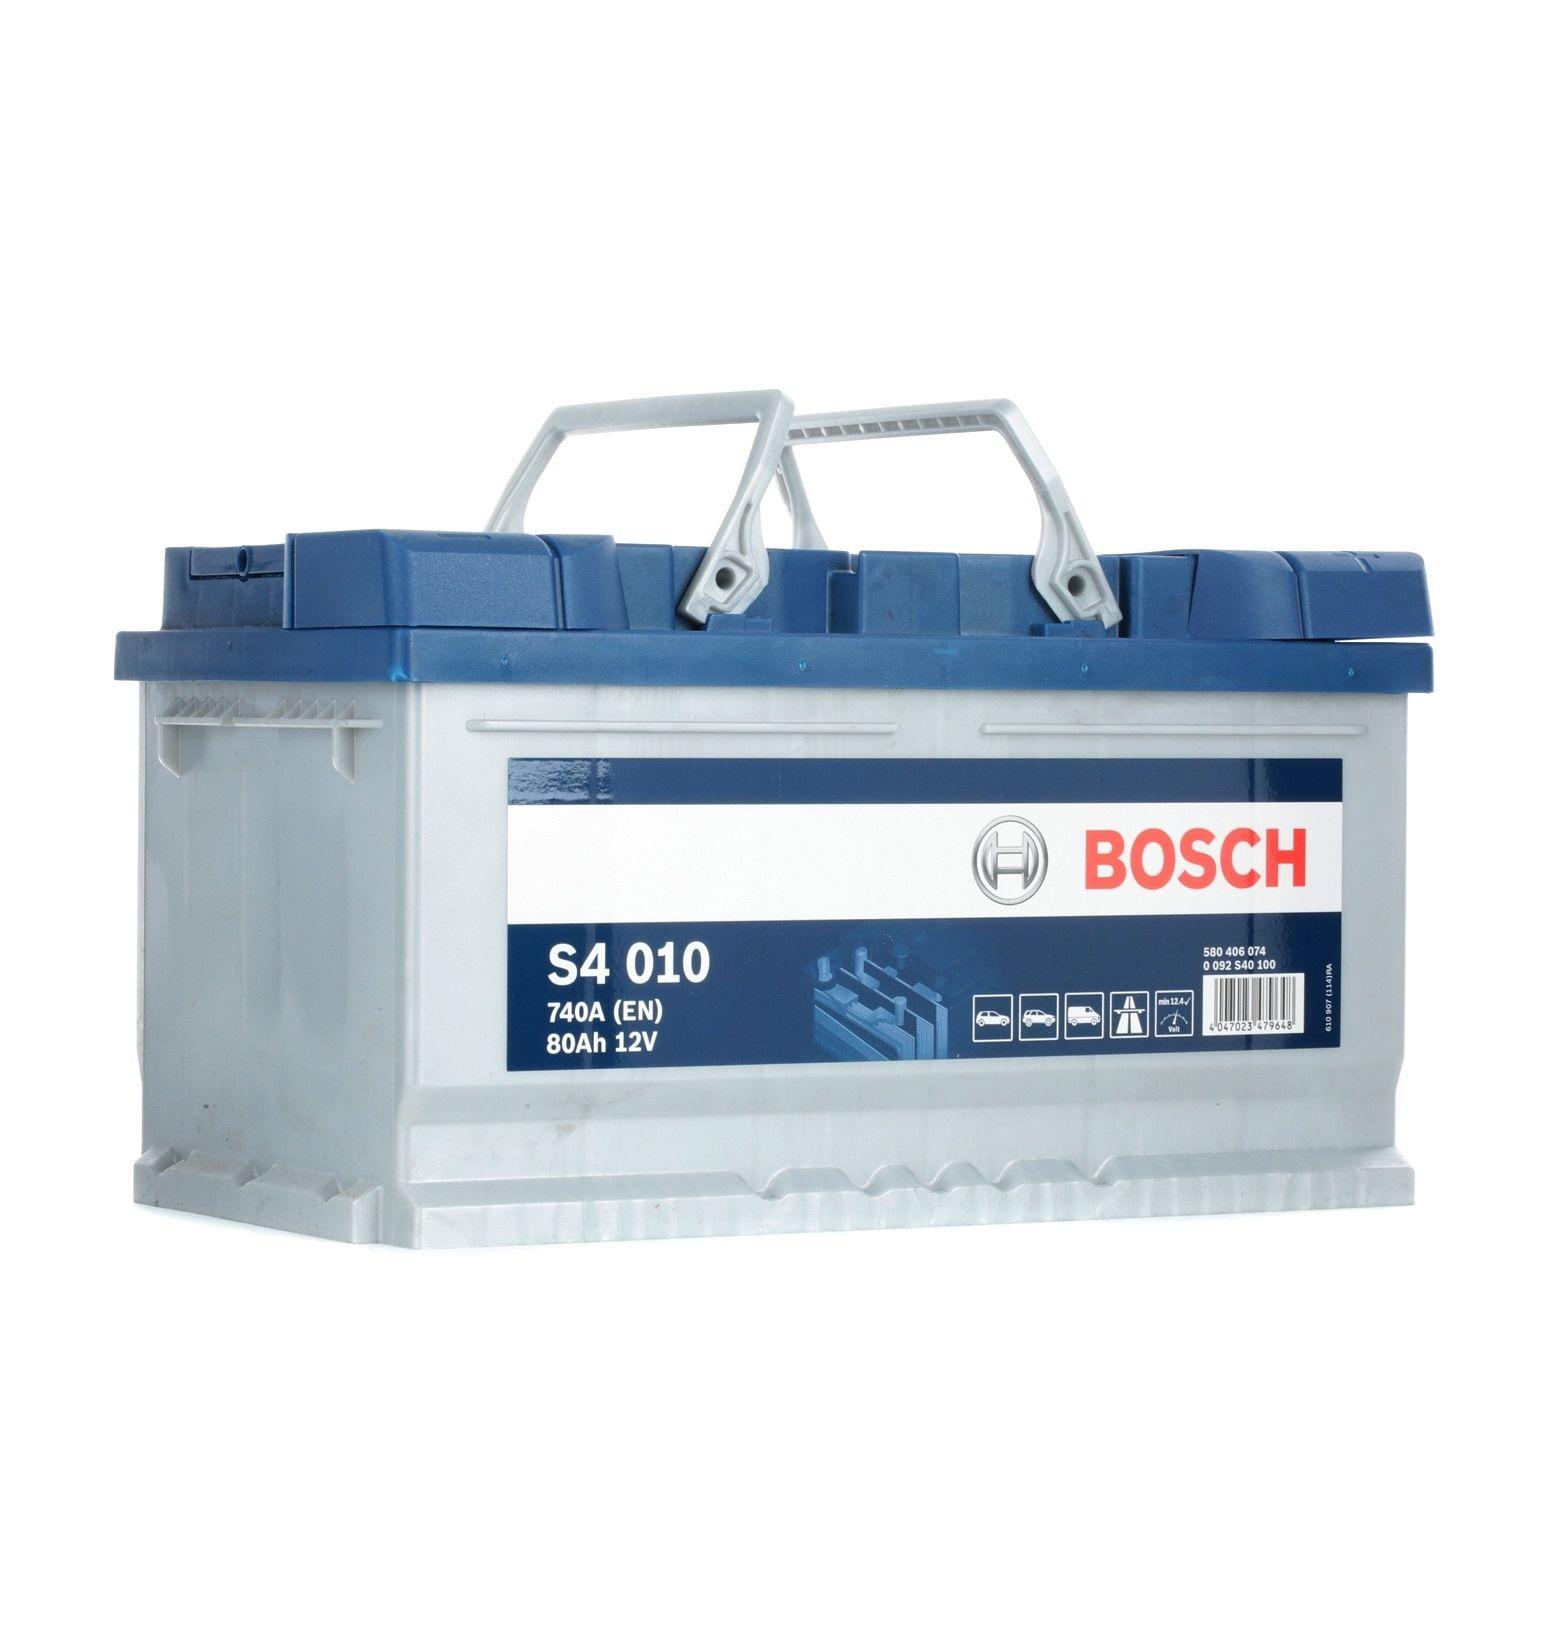 S4010 BOSCH S4 Batterie-Kapazität: 80Ah Kälteprüfstrom EN: 740A, Spannung: 12V, Polanordnung: 0 Starterbatterie 0 092 S40 100 günstig kaufen